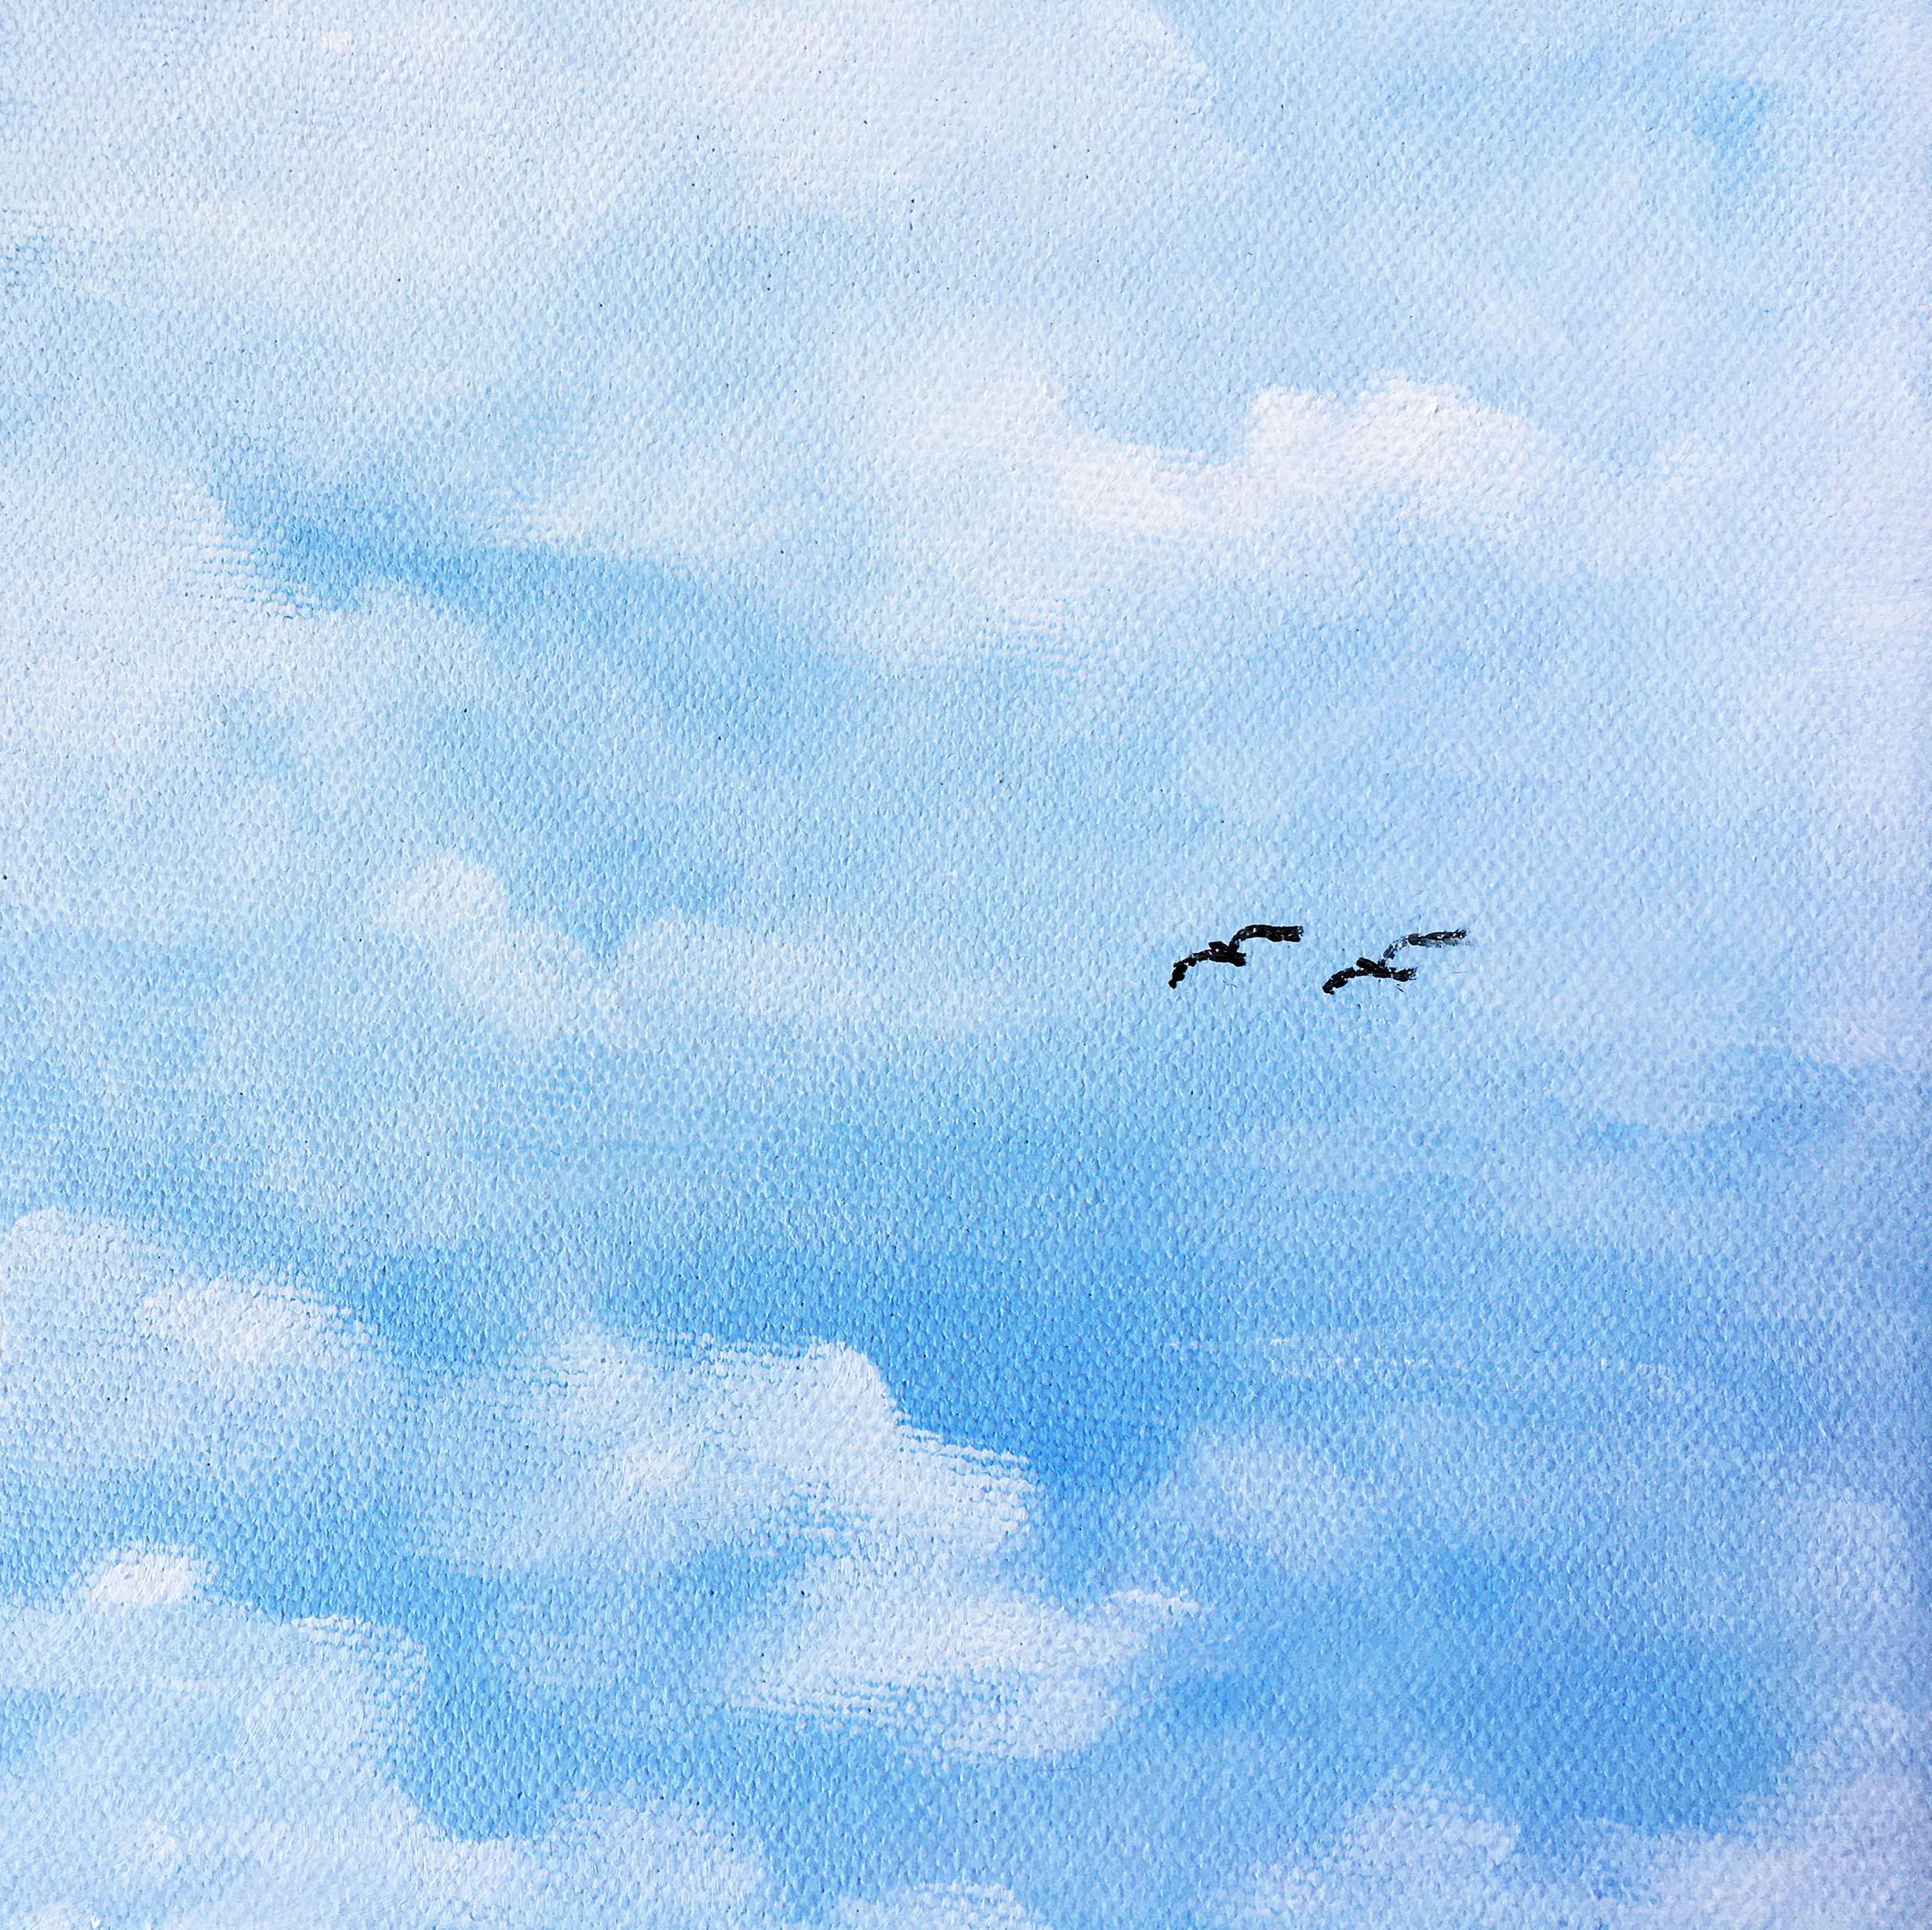 CLOUDS-BIRDS